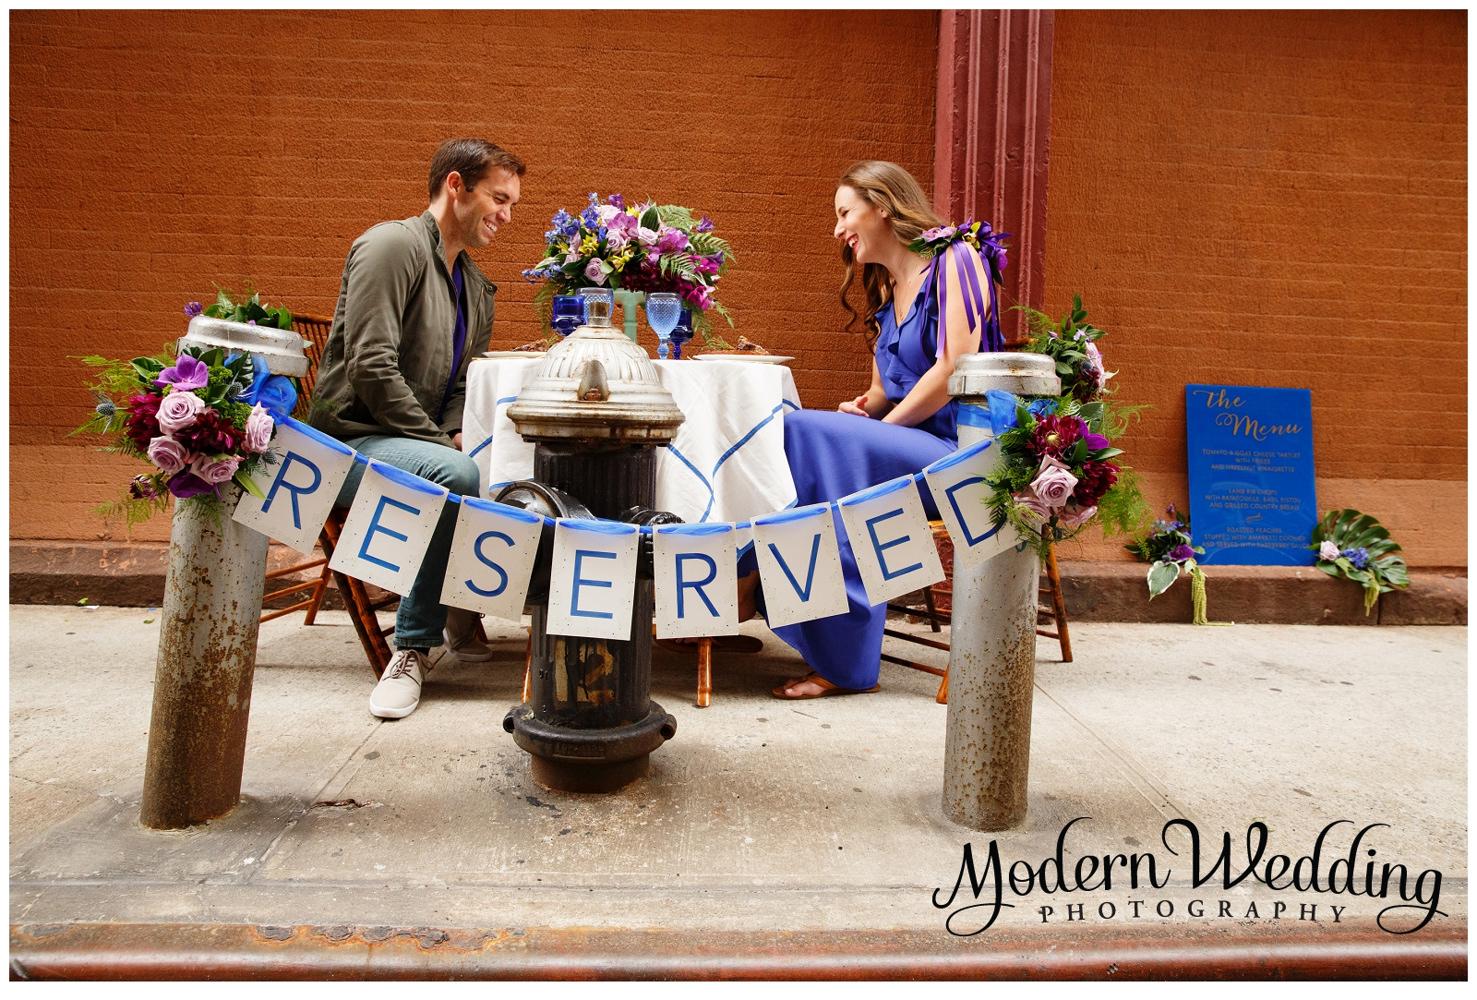 Modern Wedding Photography 47